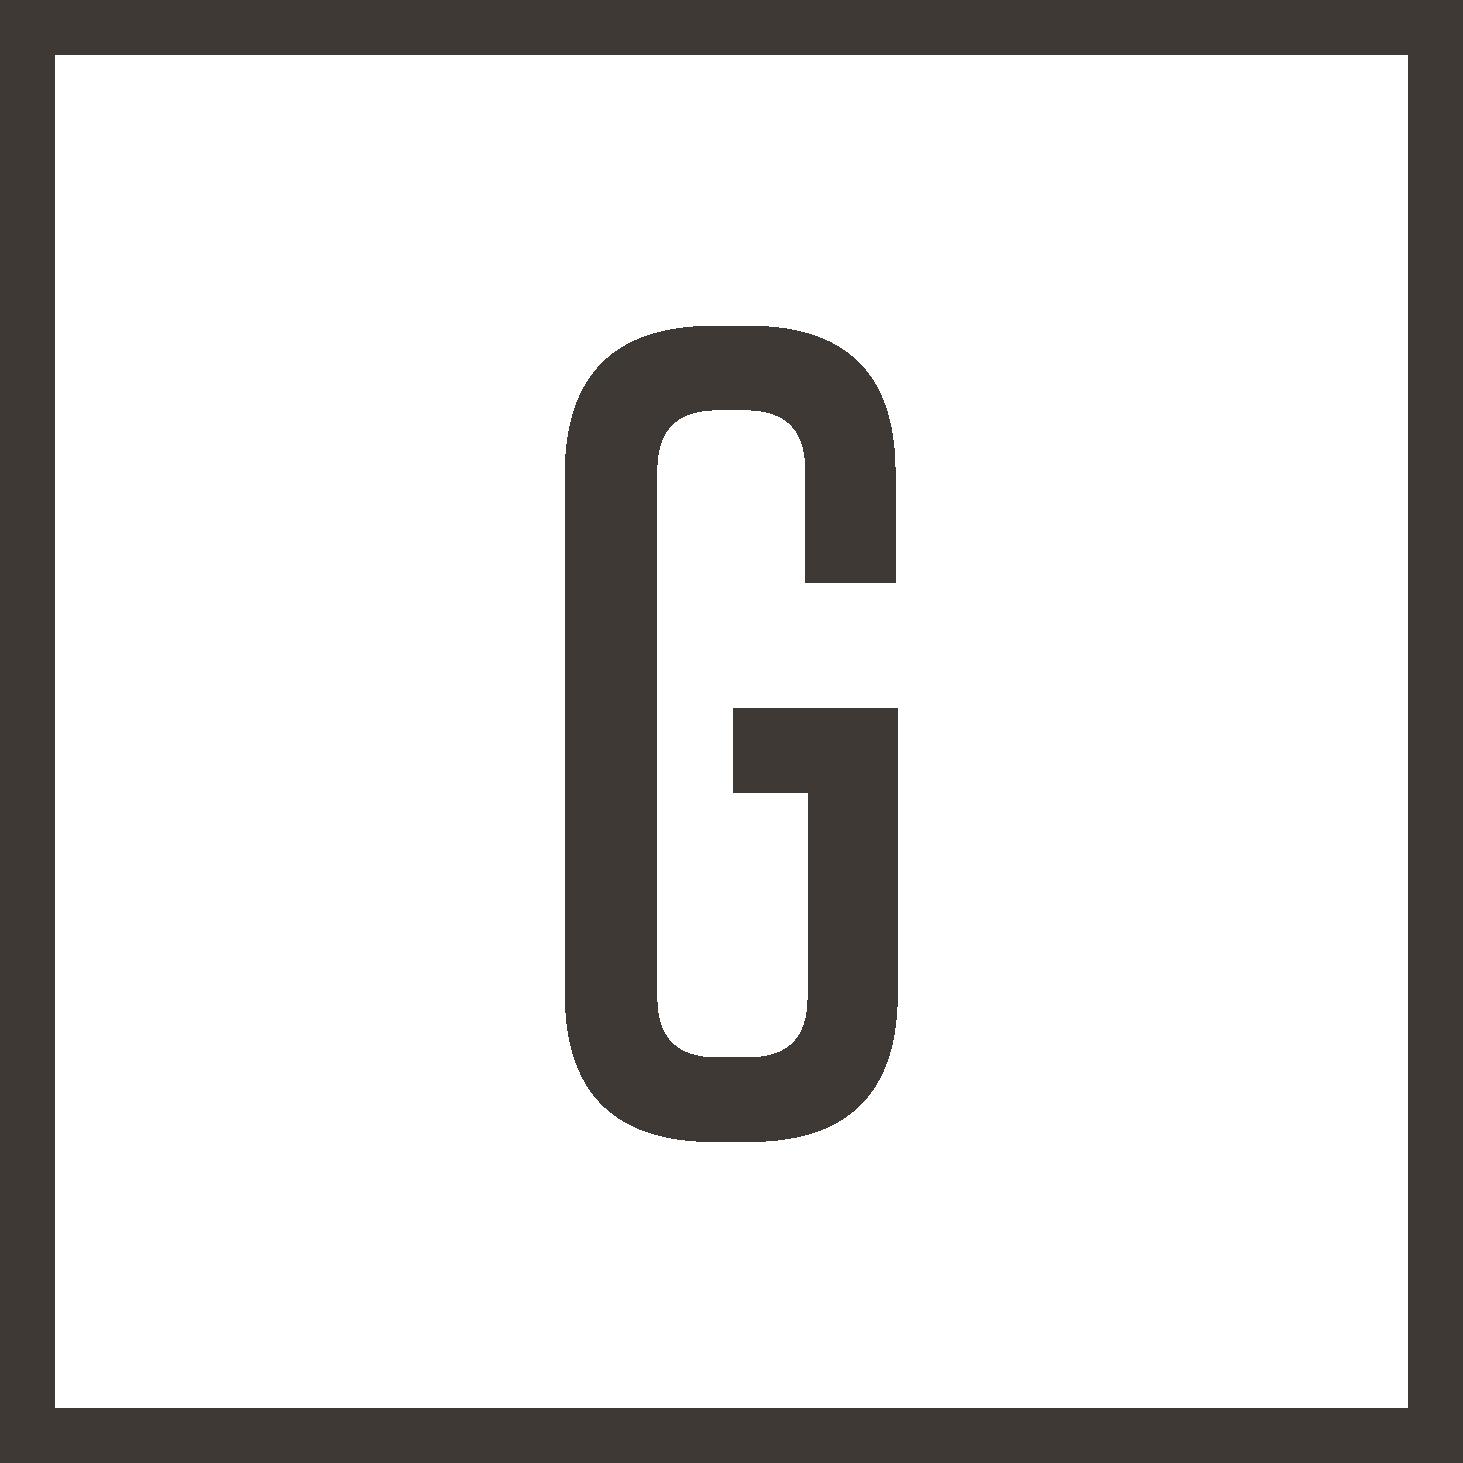 gavintdesign.com